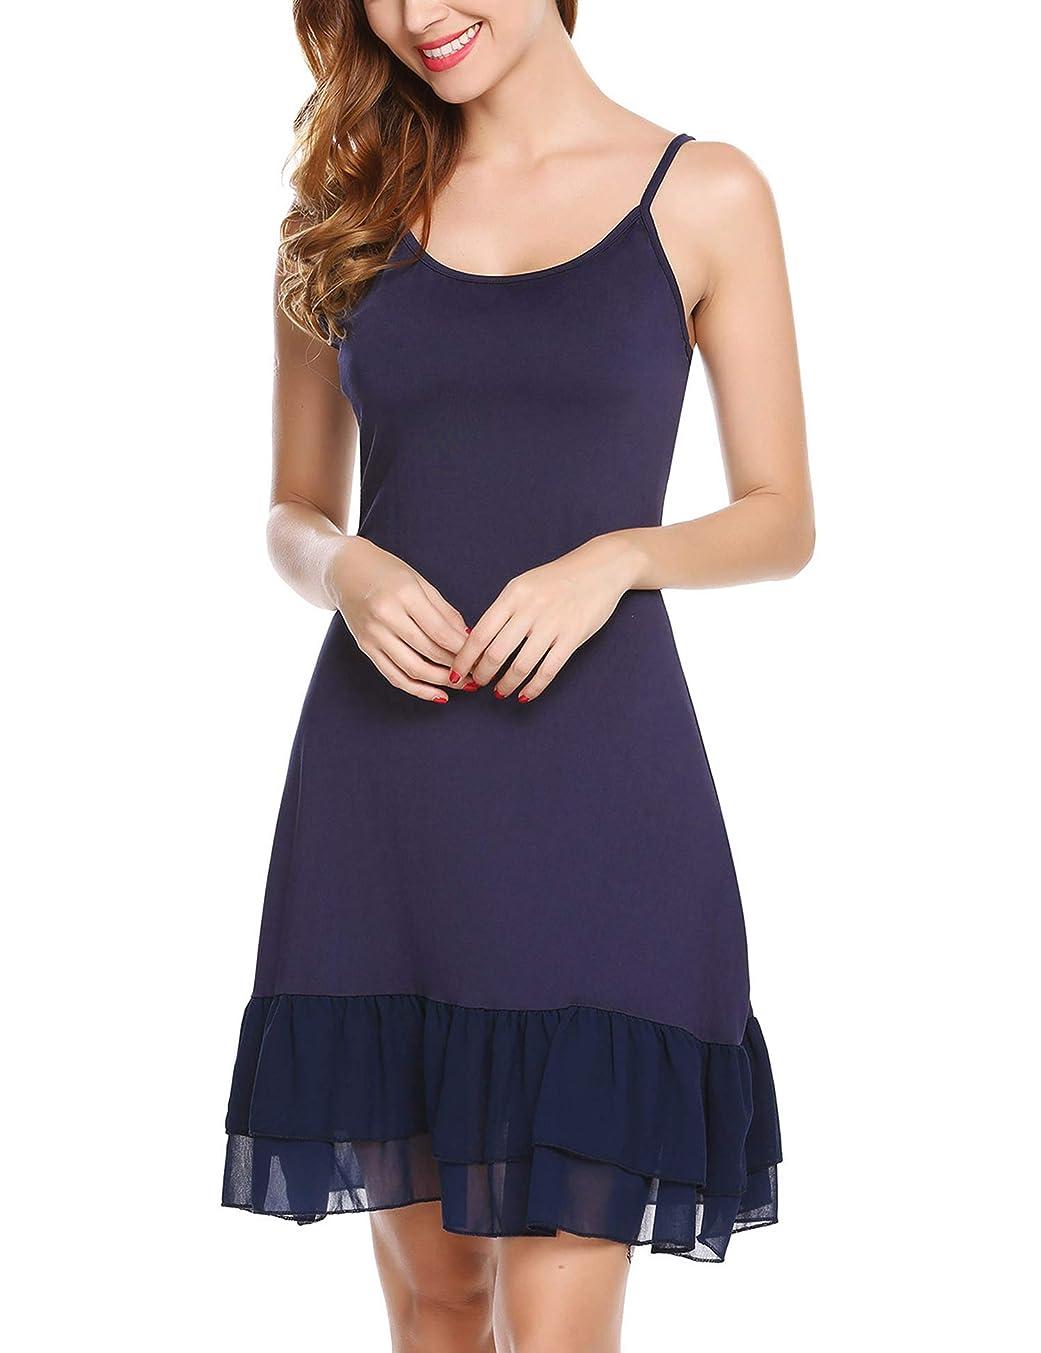 Zeagoo Women's Adjustable Spaghetti Strap Chiffon Ruffle Camisole Dress Extender